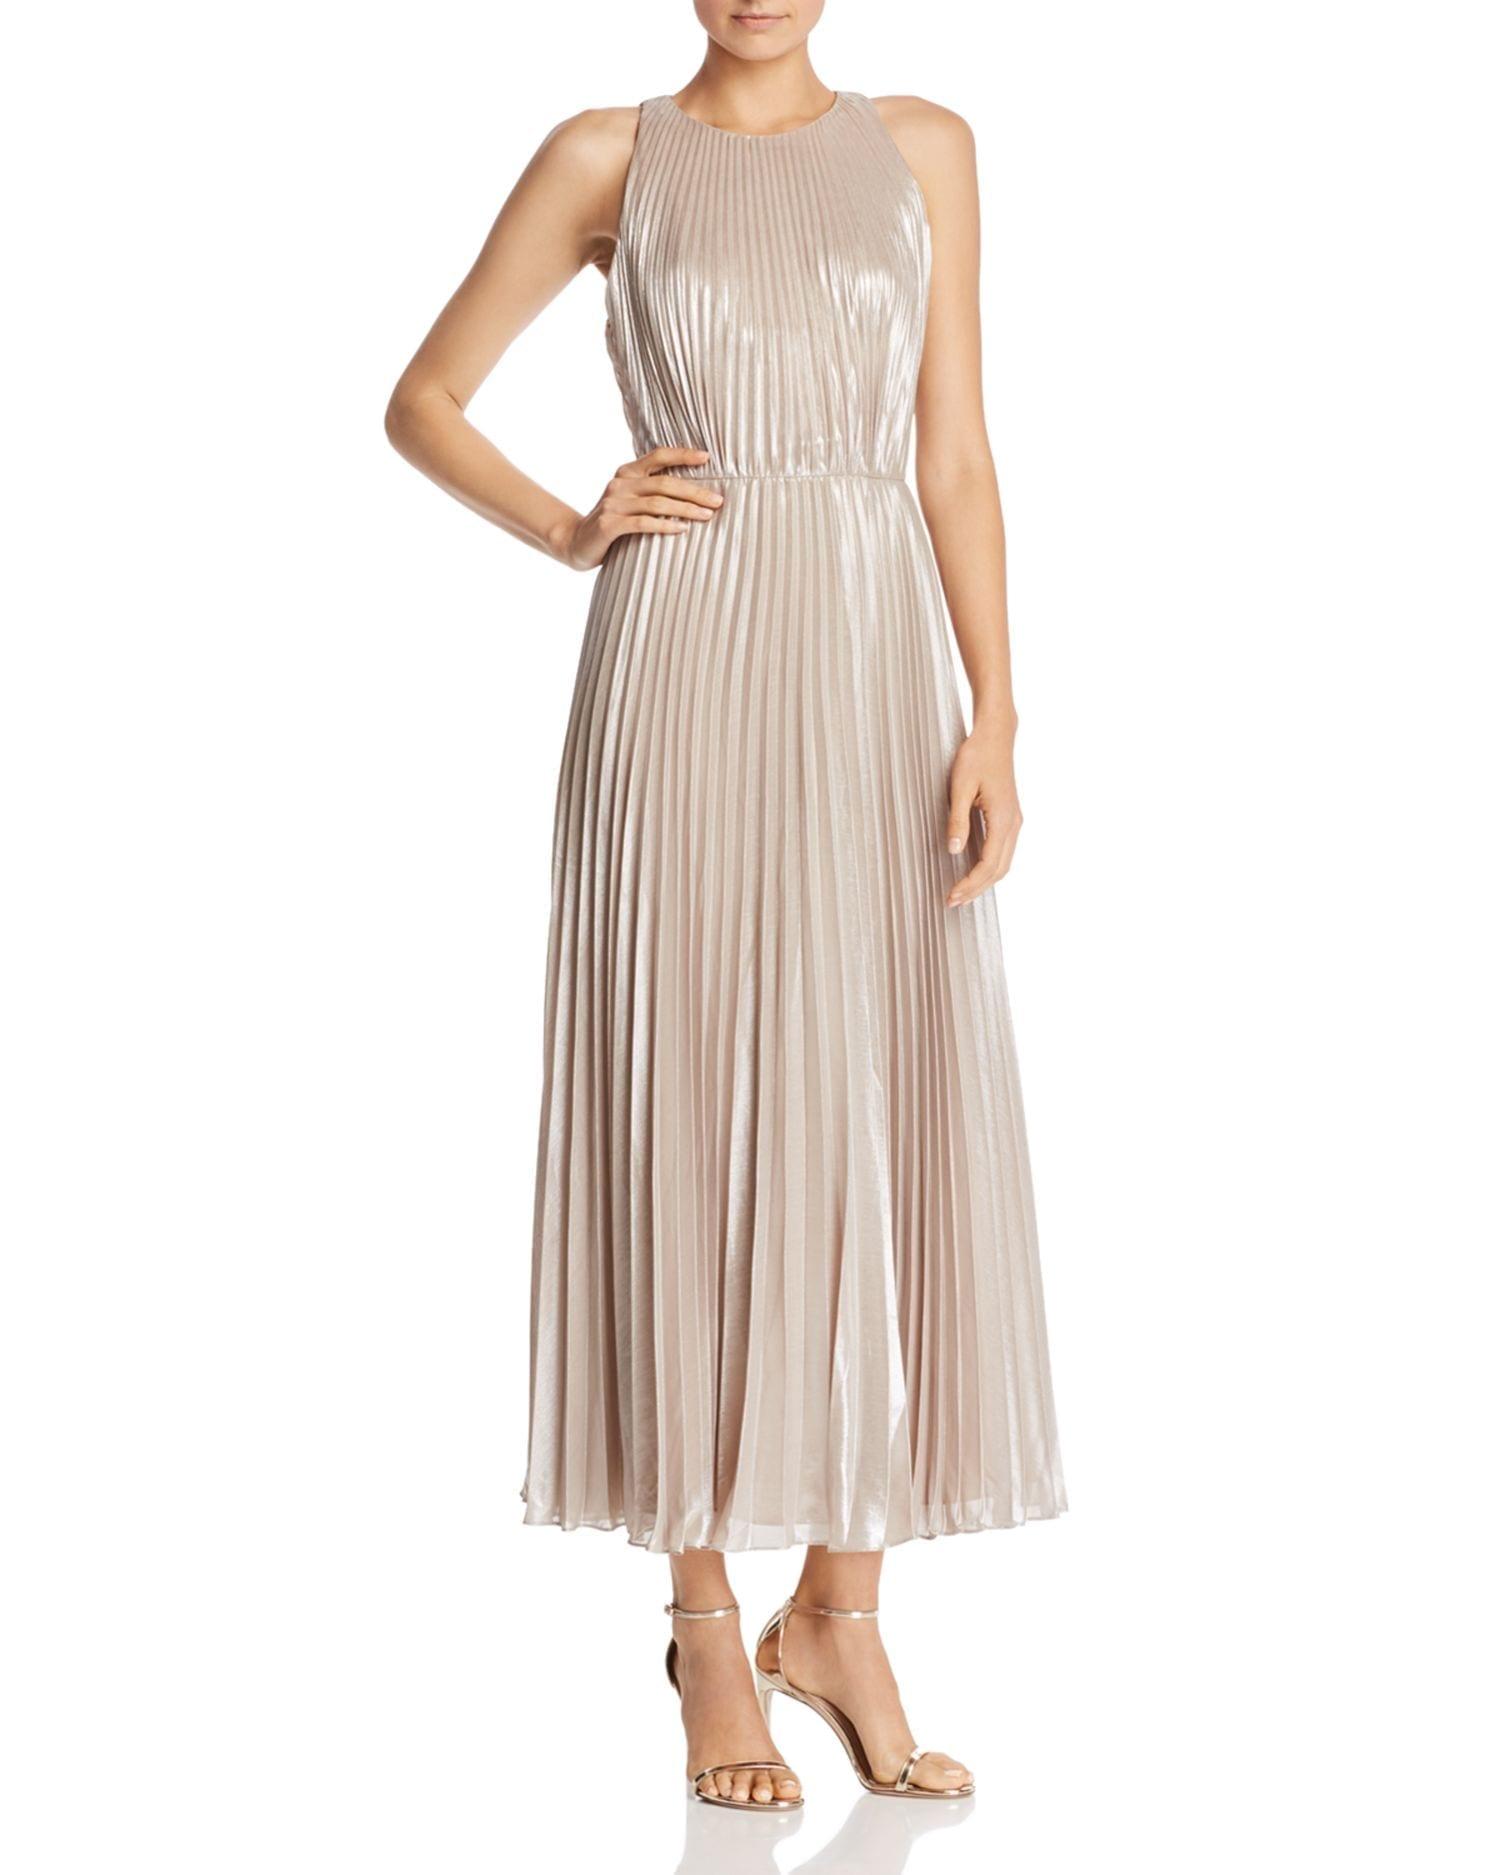 b406bd65311 JILL JILL STUART Metallic Chiffon Champagne Gown - We Select Dresses